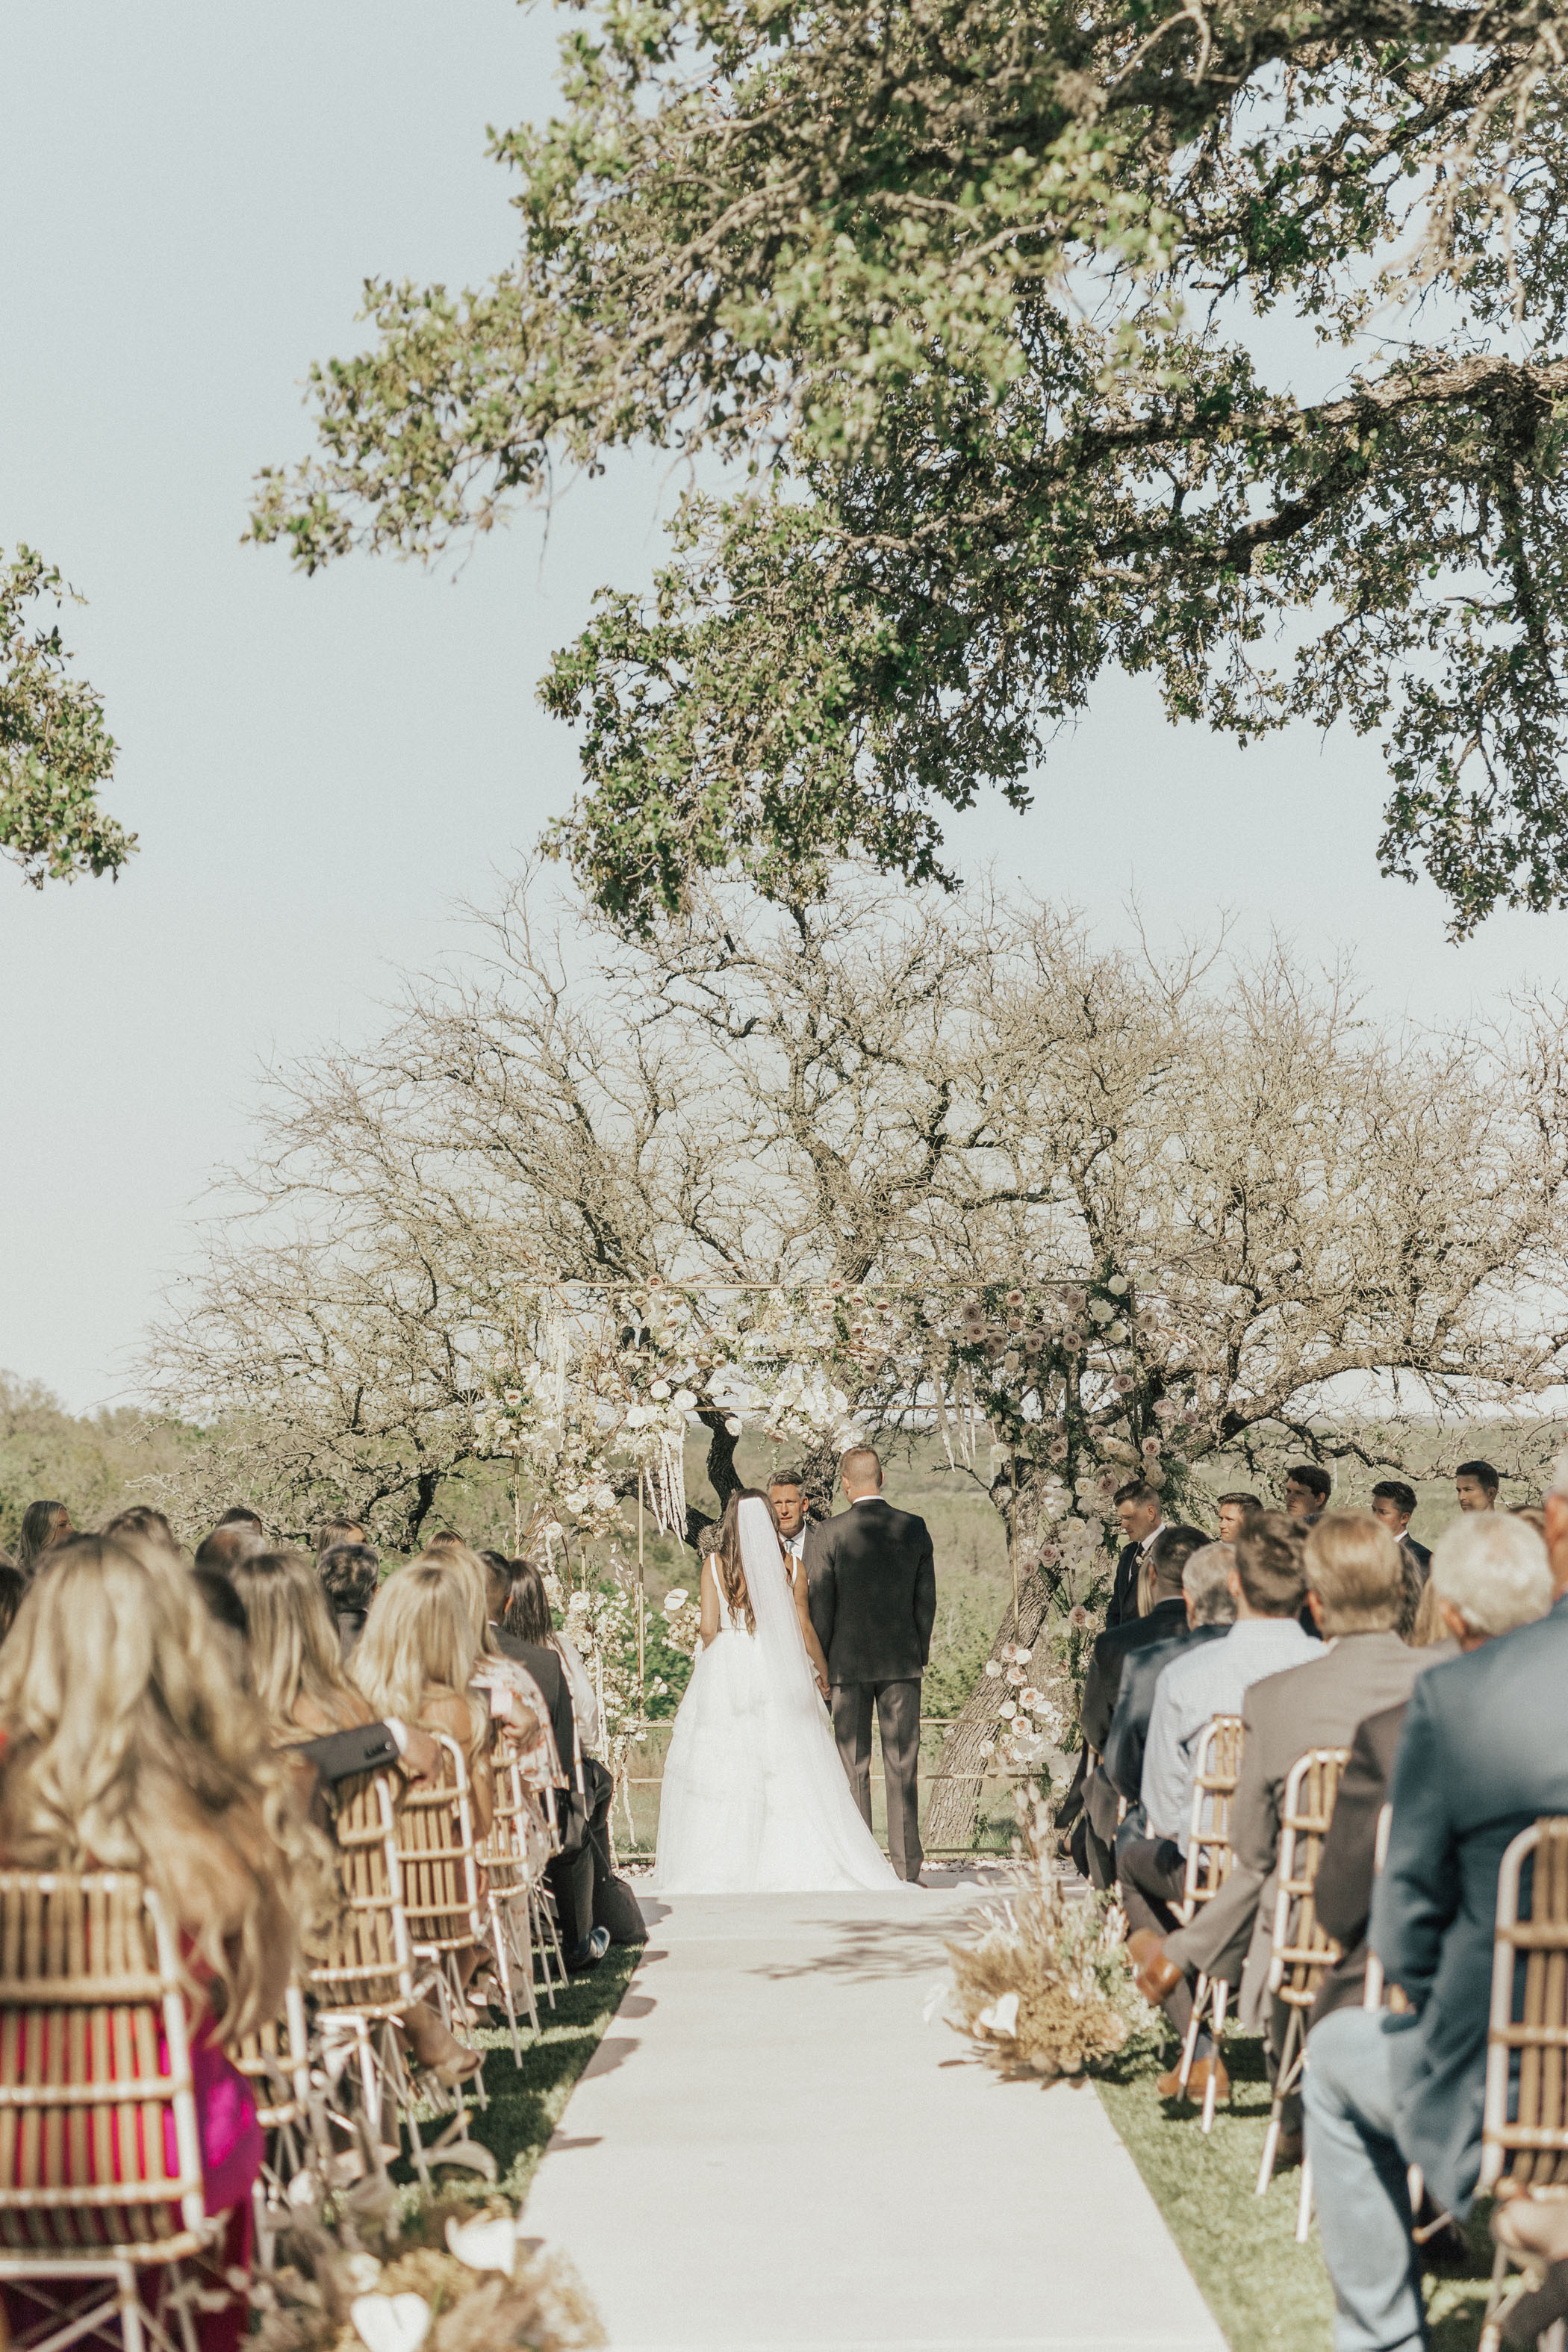 Texas Wedding with White Bridesmaid Dresses + Terracotta Details